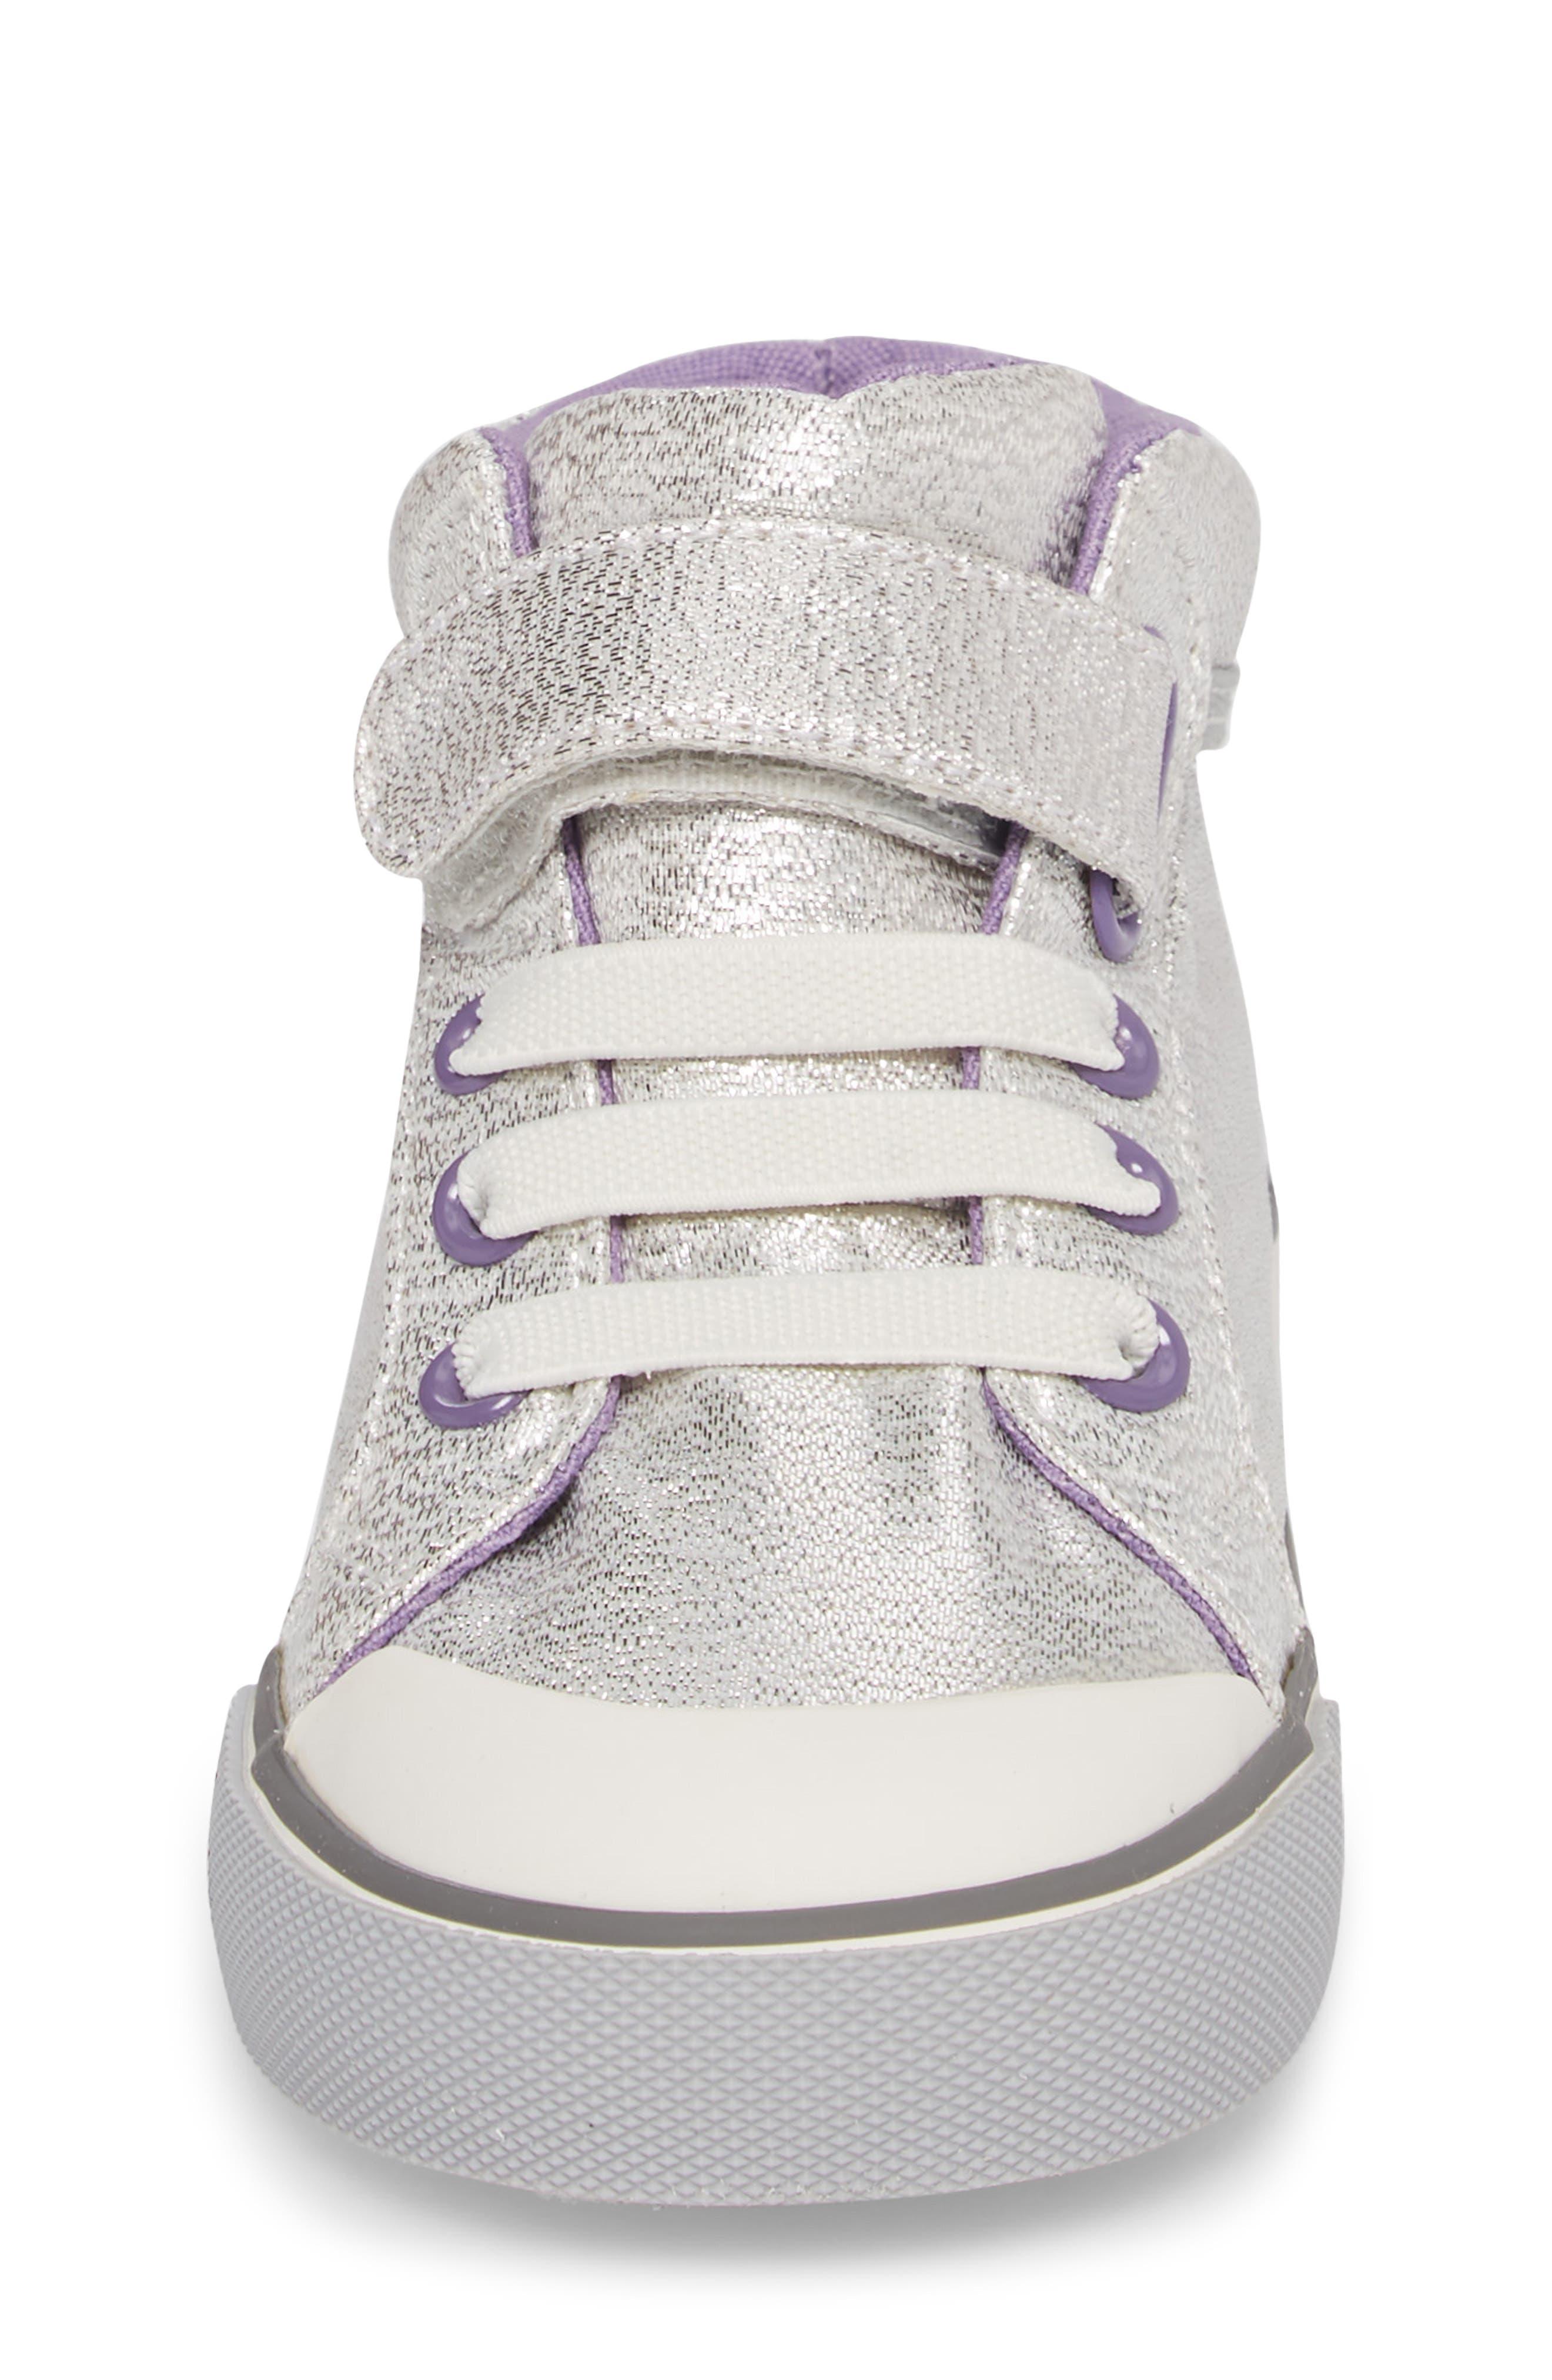 Peyton Metallic Mid Top Sneaker,                             Alternate thumbnail 4, color,                             SILVER GLITTER